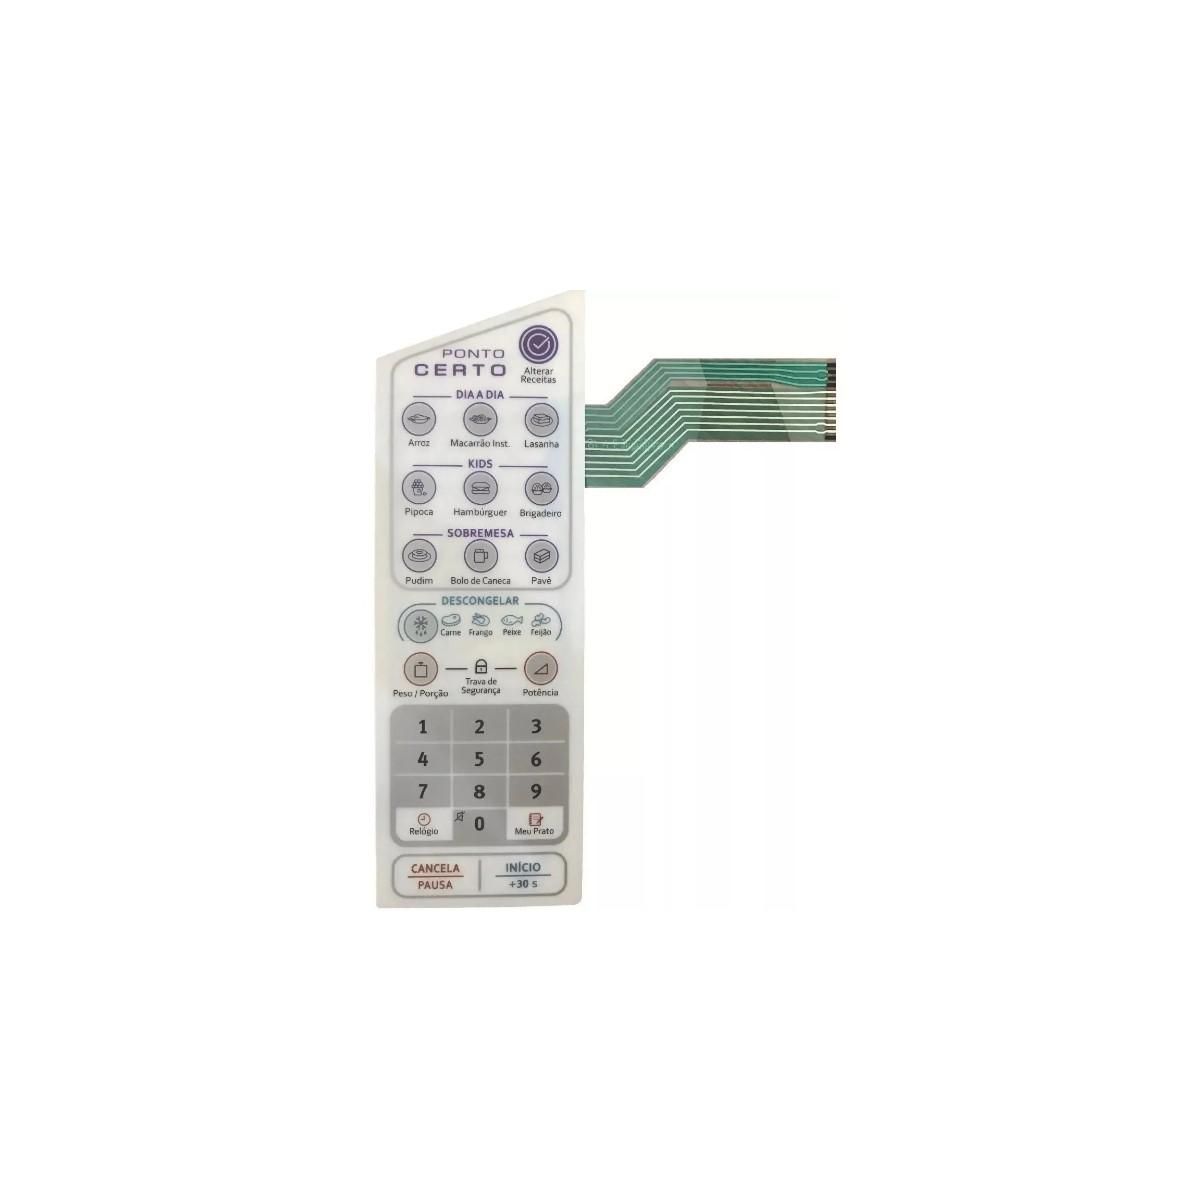 Membrana Teclado Microondas Electrolux Mep41